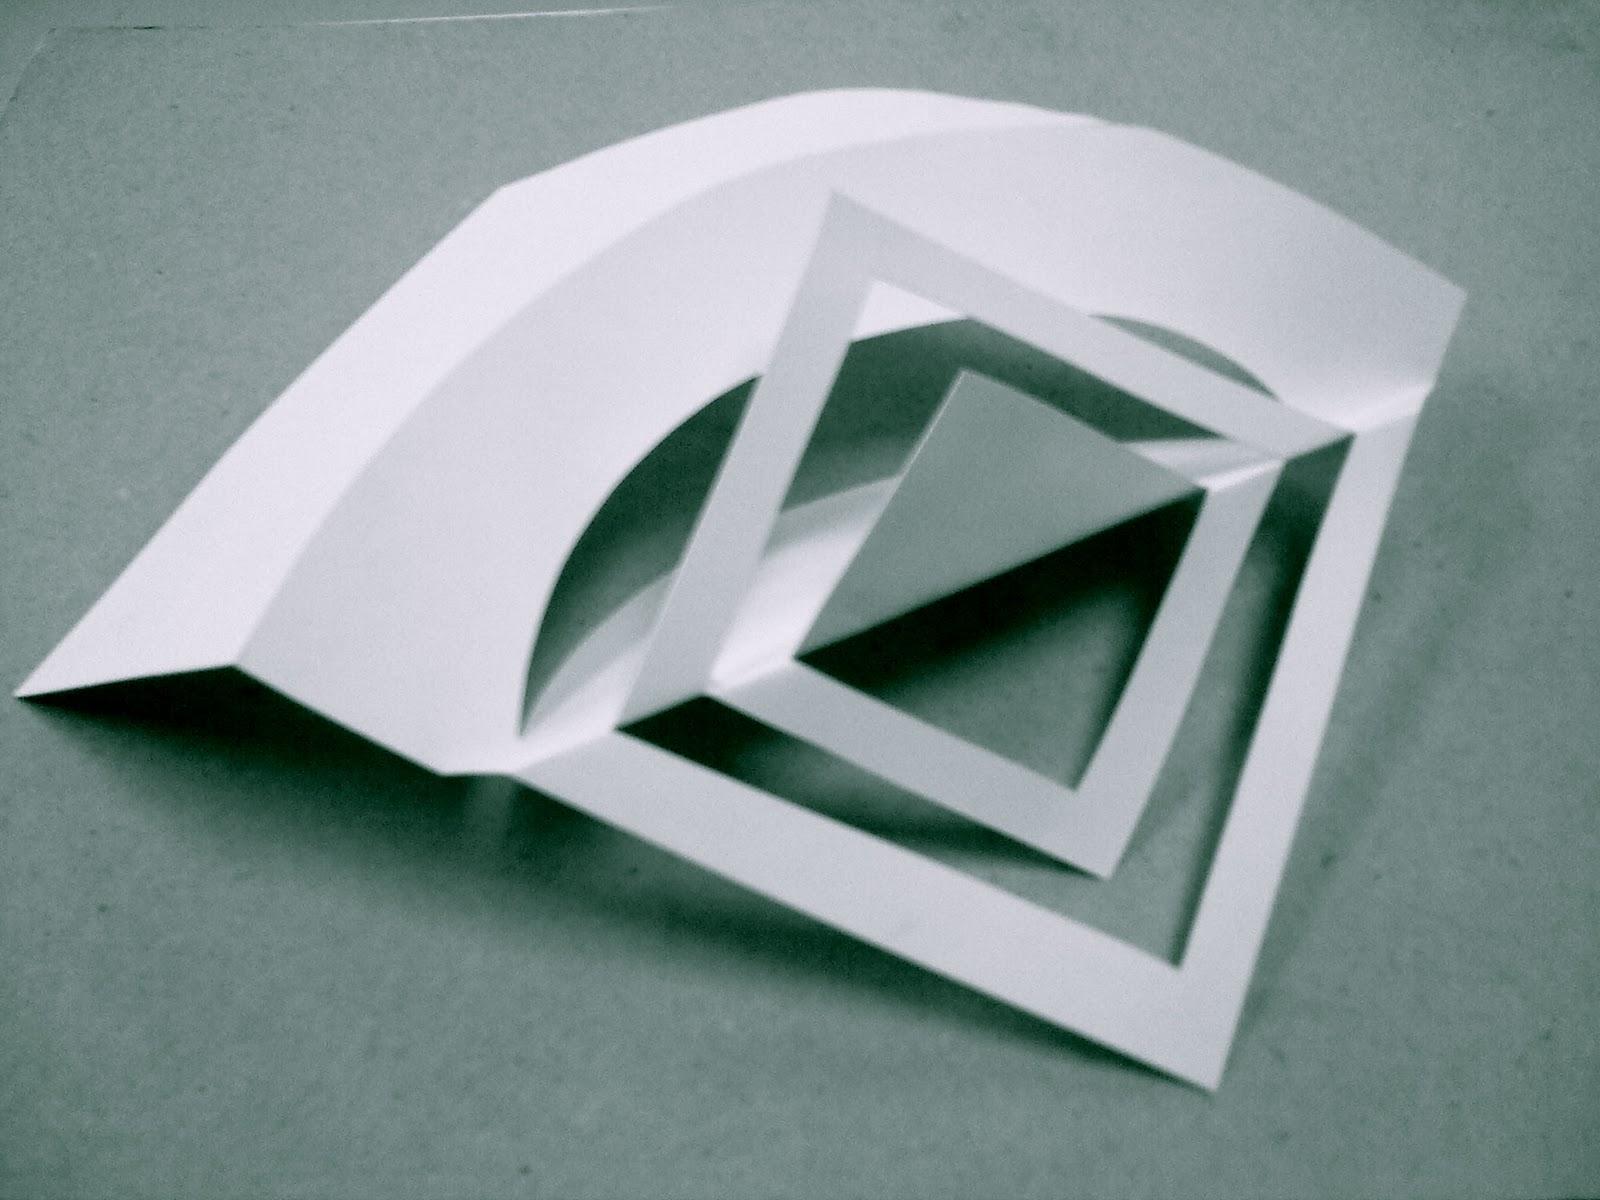 Grace Mayer: Richard Sweeney - Paper Sculpture